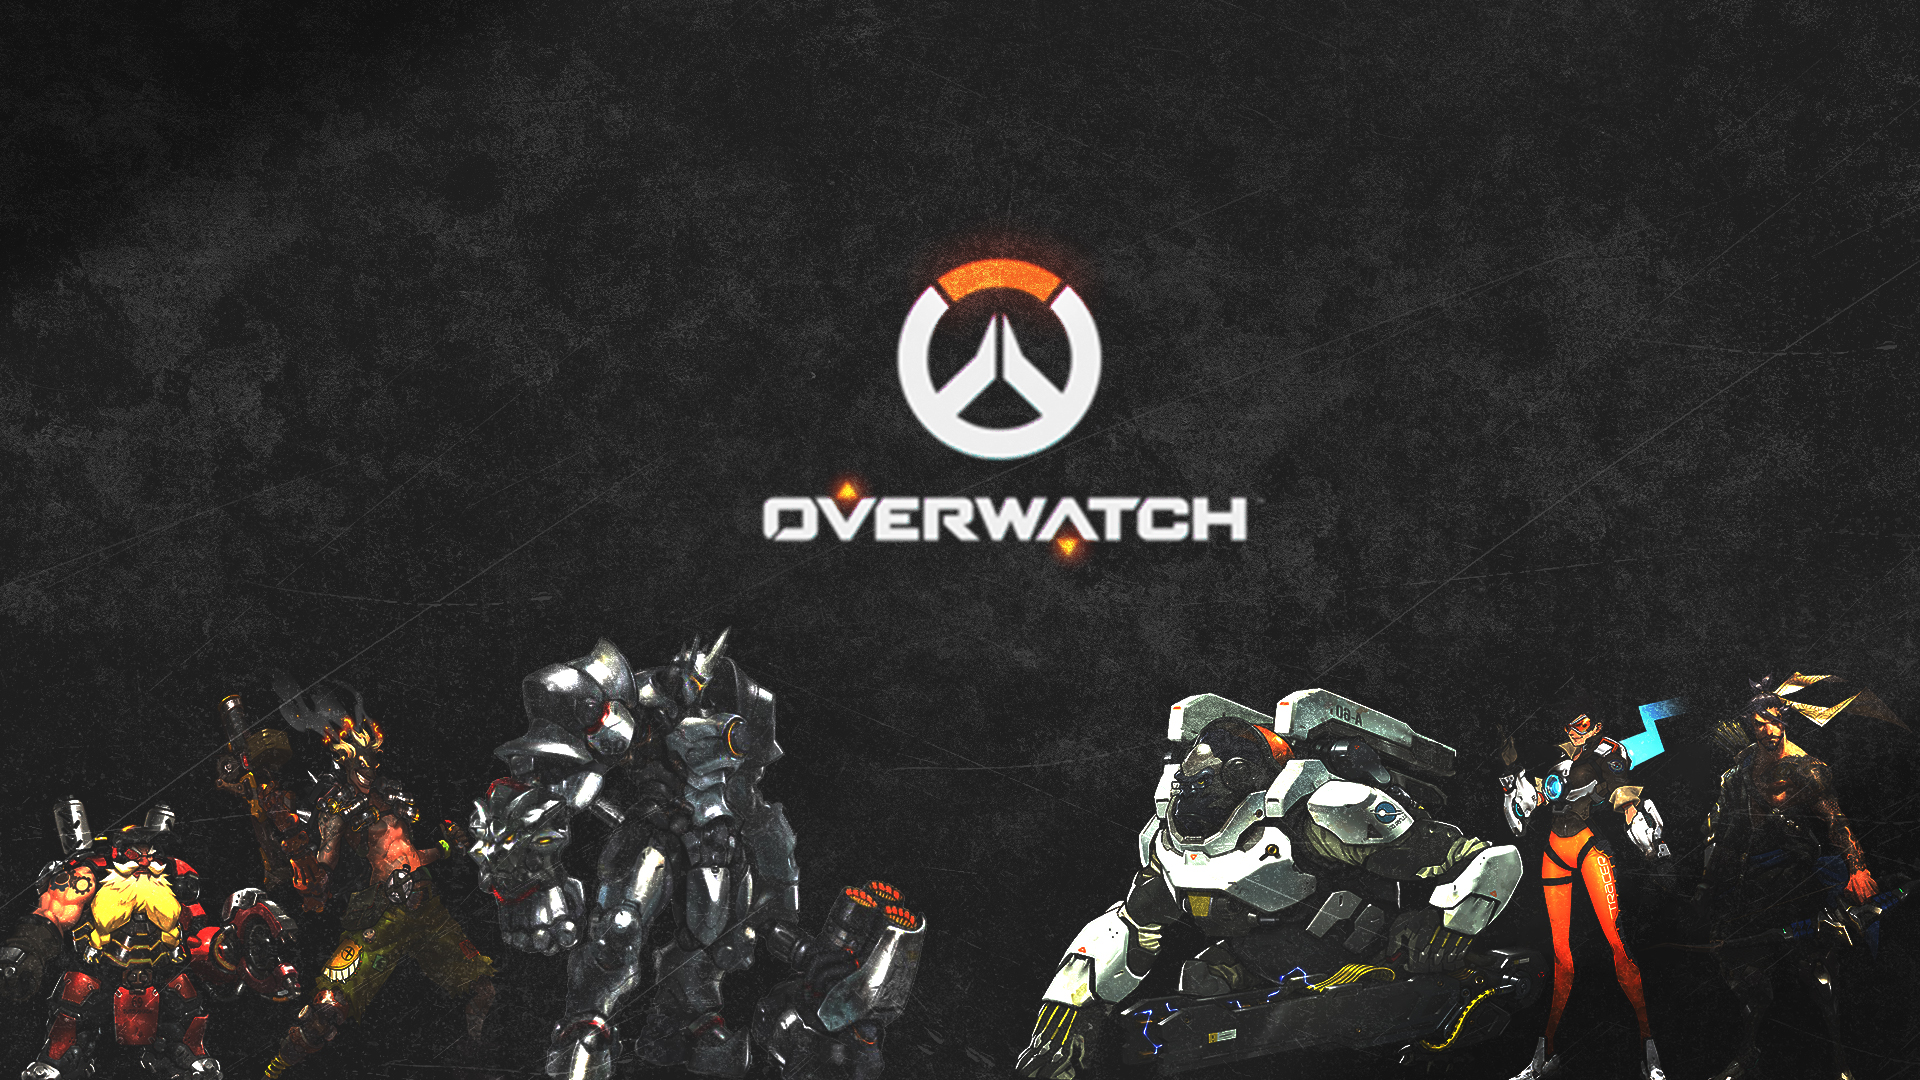 Overwatch Hd Wallpaper Background Image 1920x1080 Id